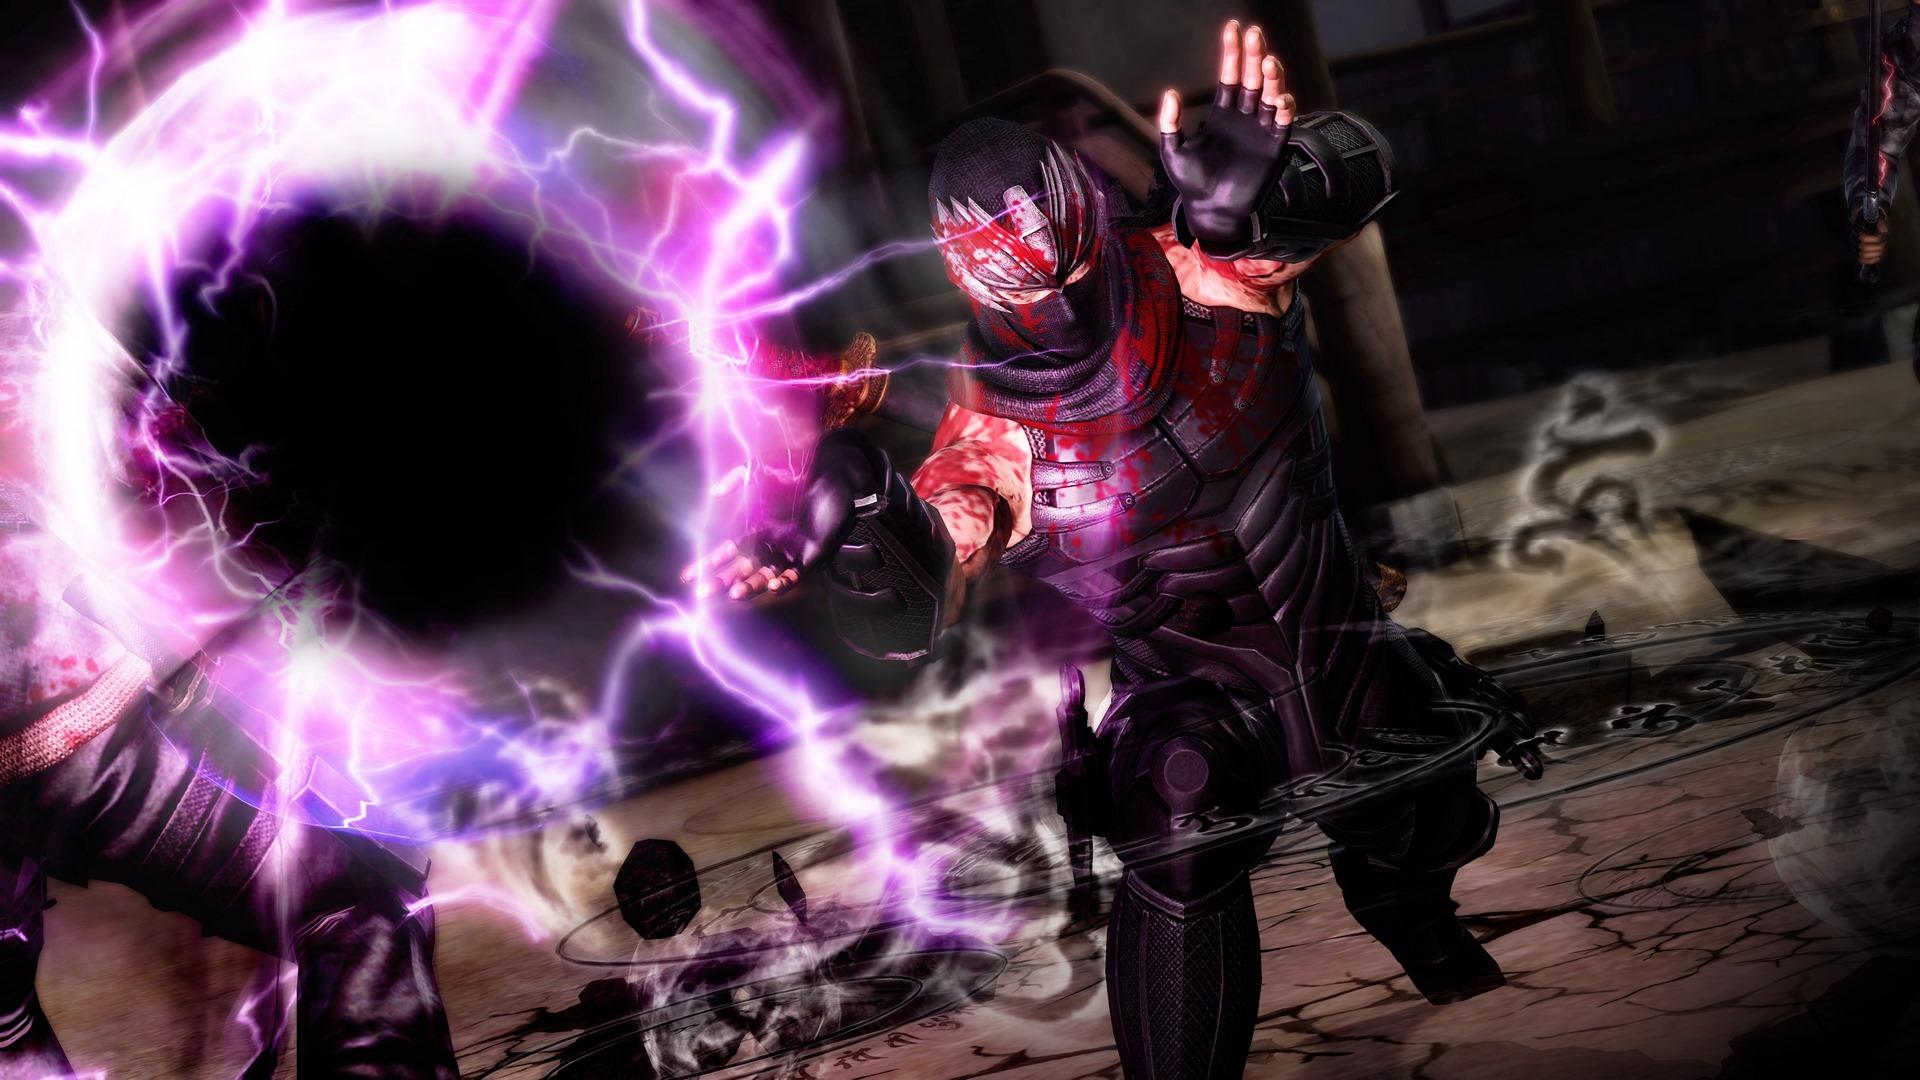 Ninja Gaiden 3 Razor S Edge For Xbox 360 Supports Smartglass